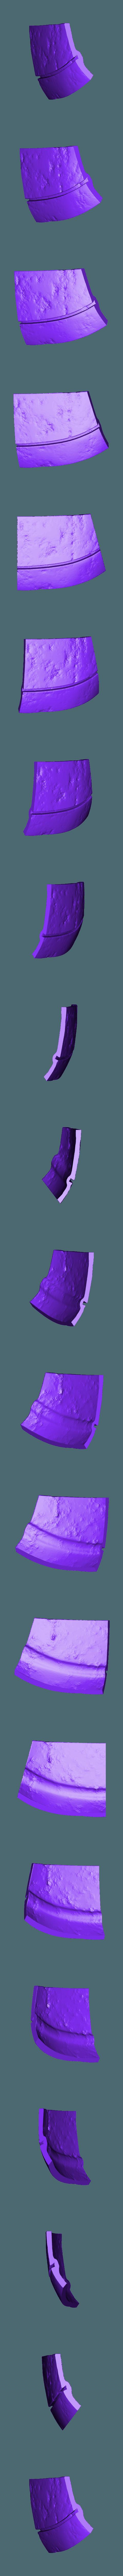 Armory_Damaged_Print21.obj Download OBJ file Armory - Knights of Ren Helmet (damaged), 3D print model • 3D print design, 3D-mon